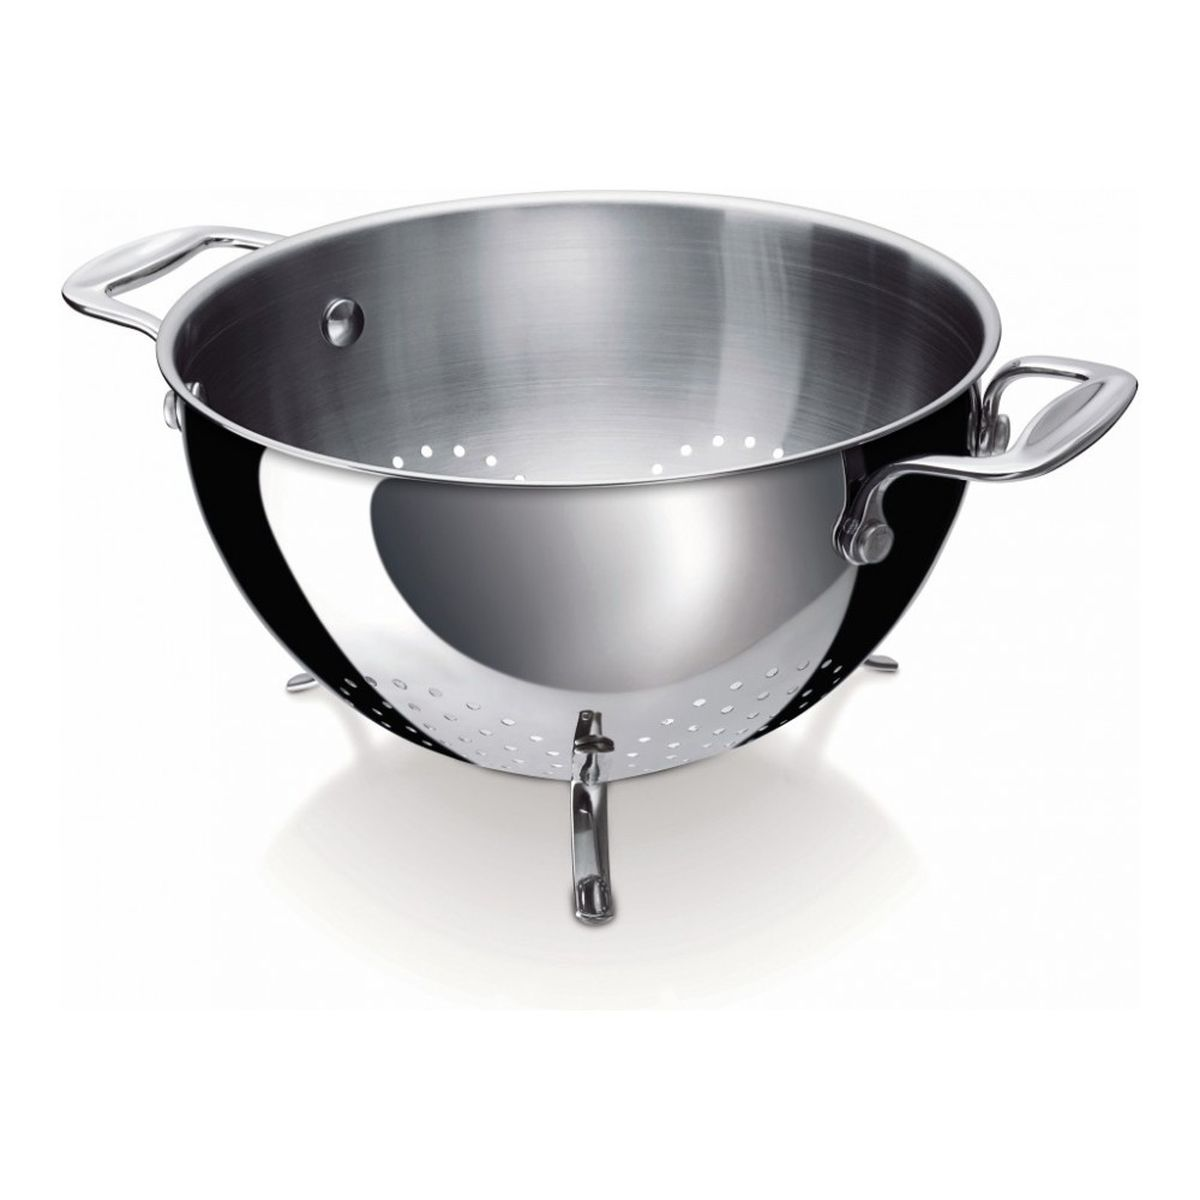 Дуршлаг Beka Chef, диаметр 22 см цена